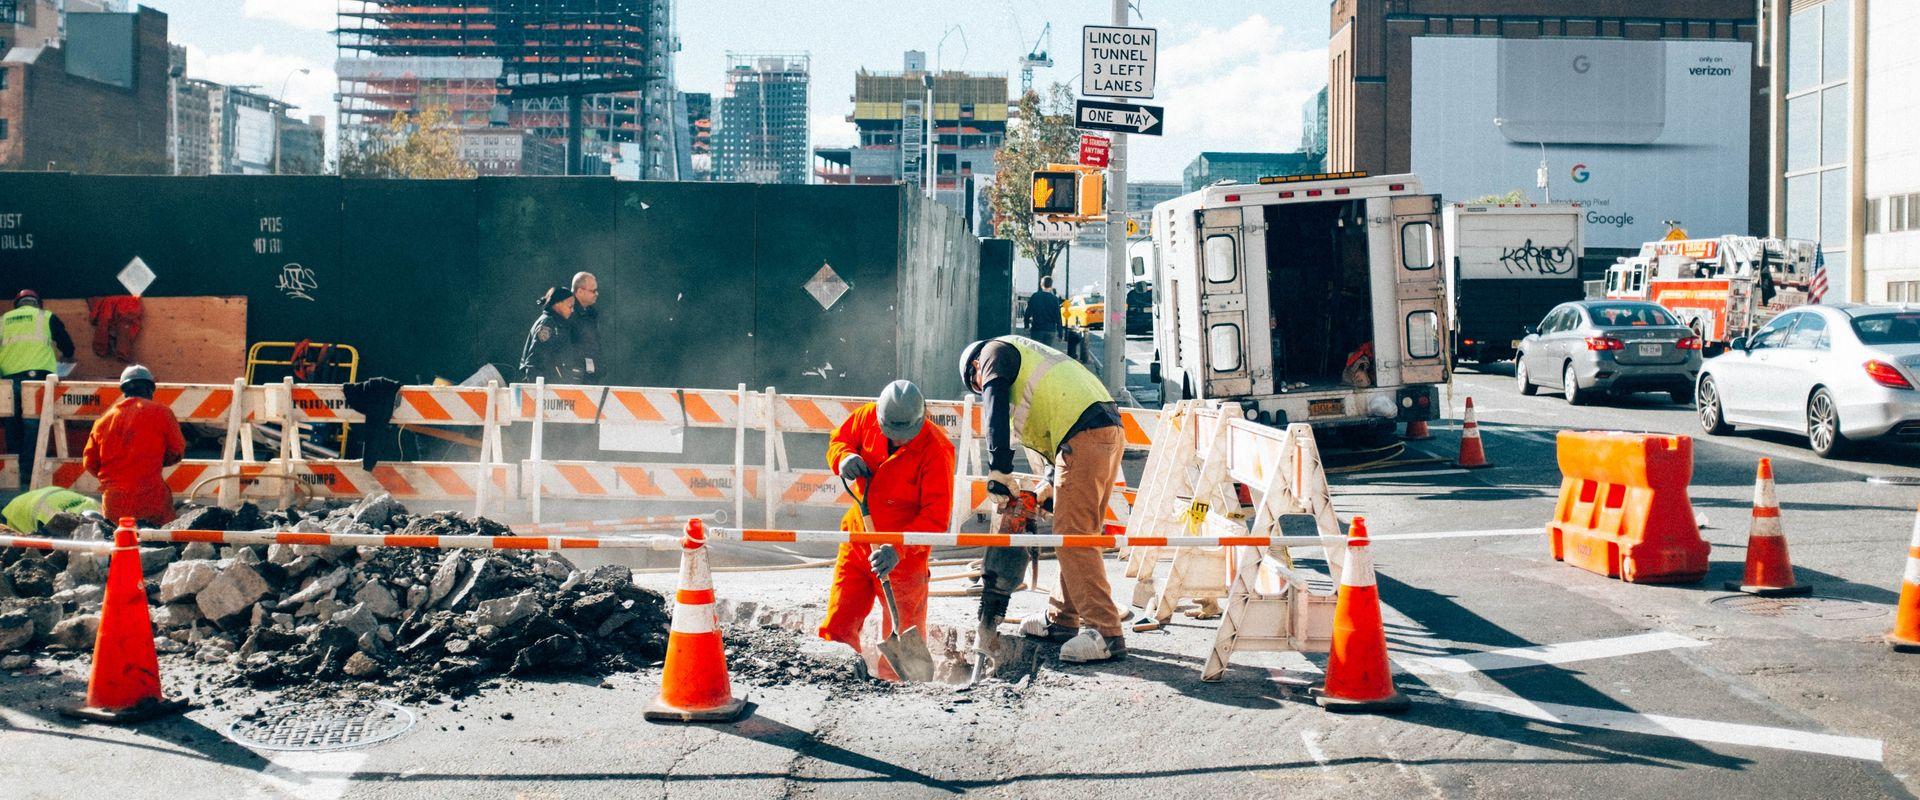 construction site downtown